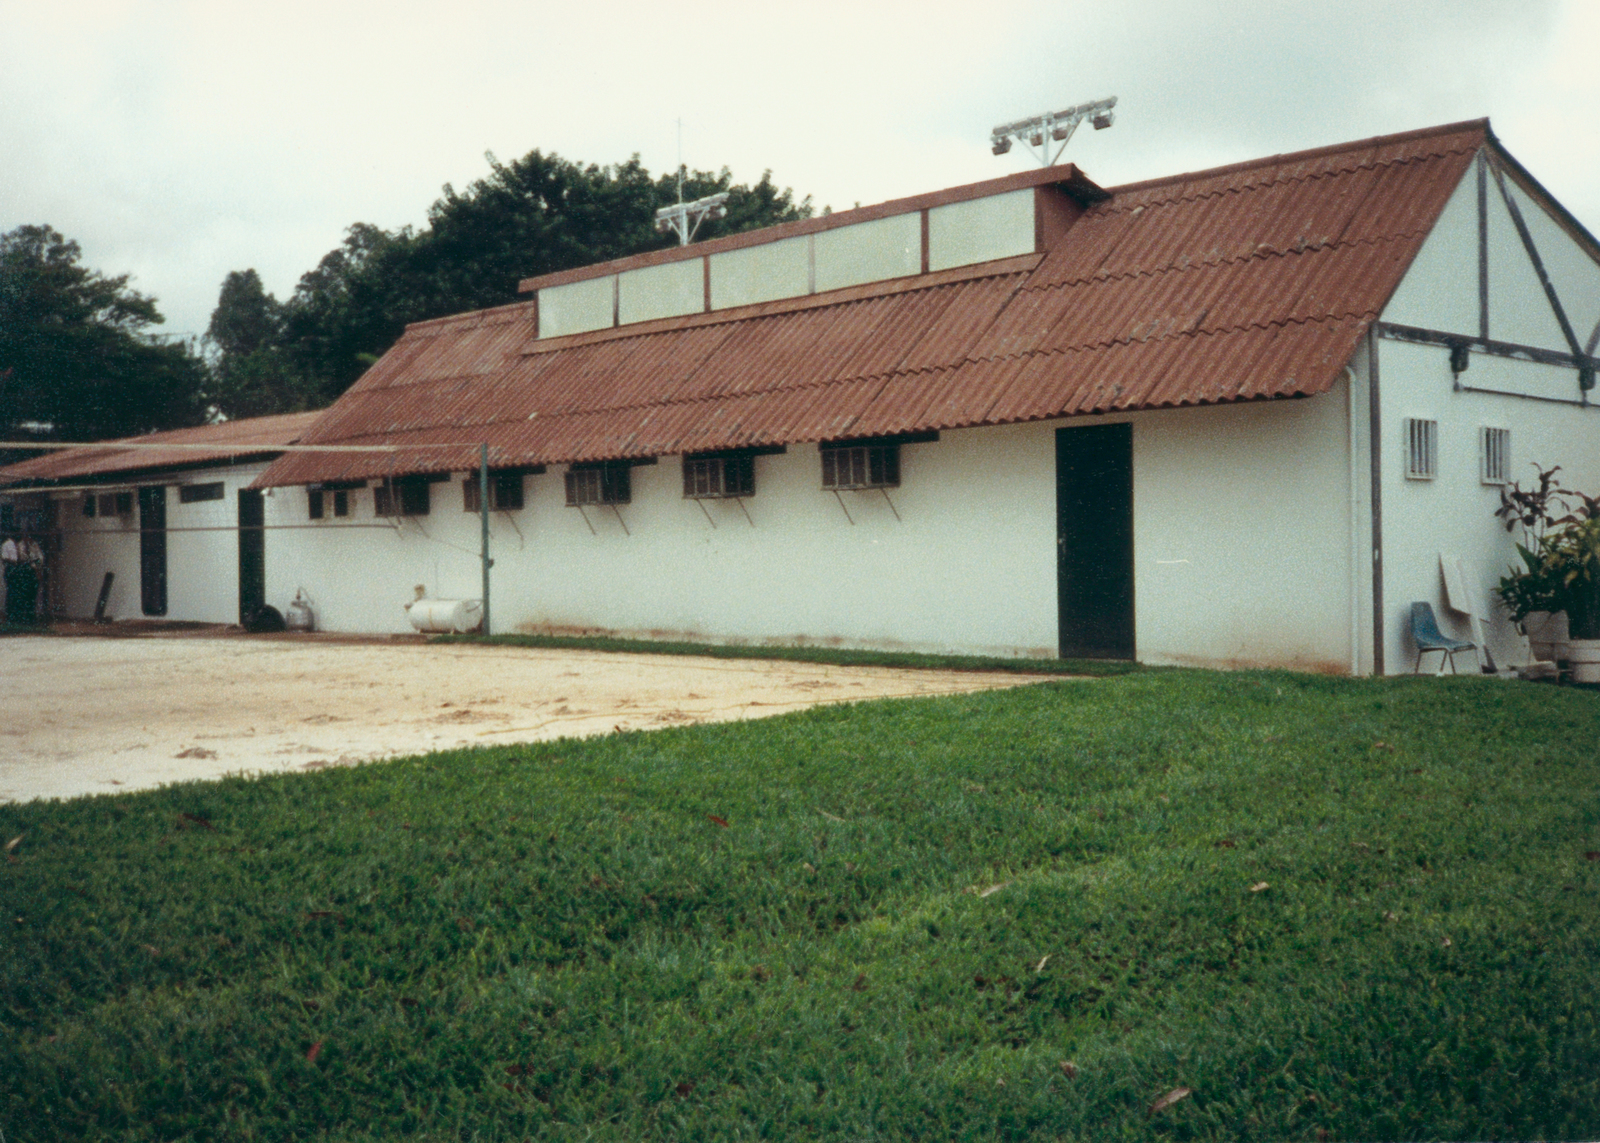 Brasilia - Recreation/Community Center/Gym/Theater - 1989